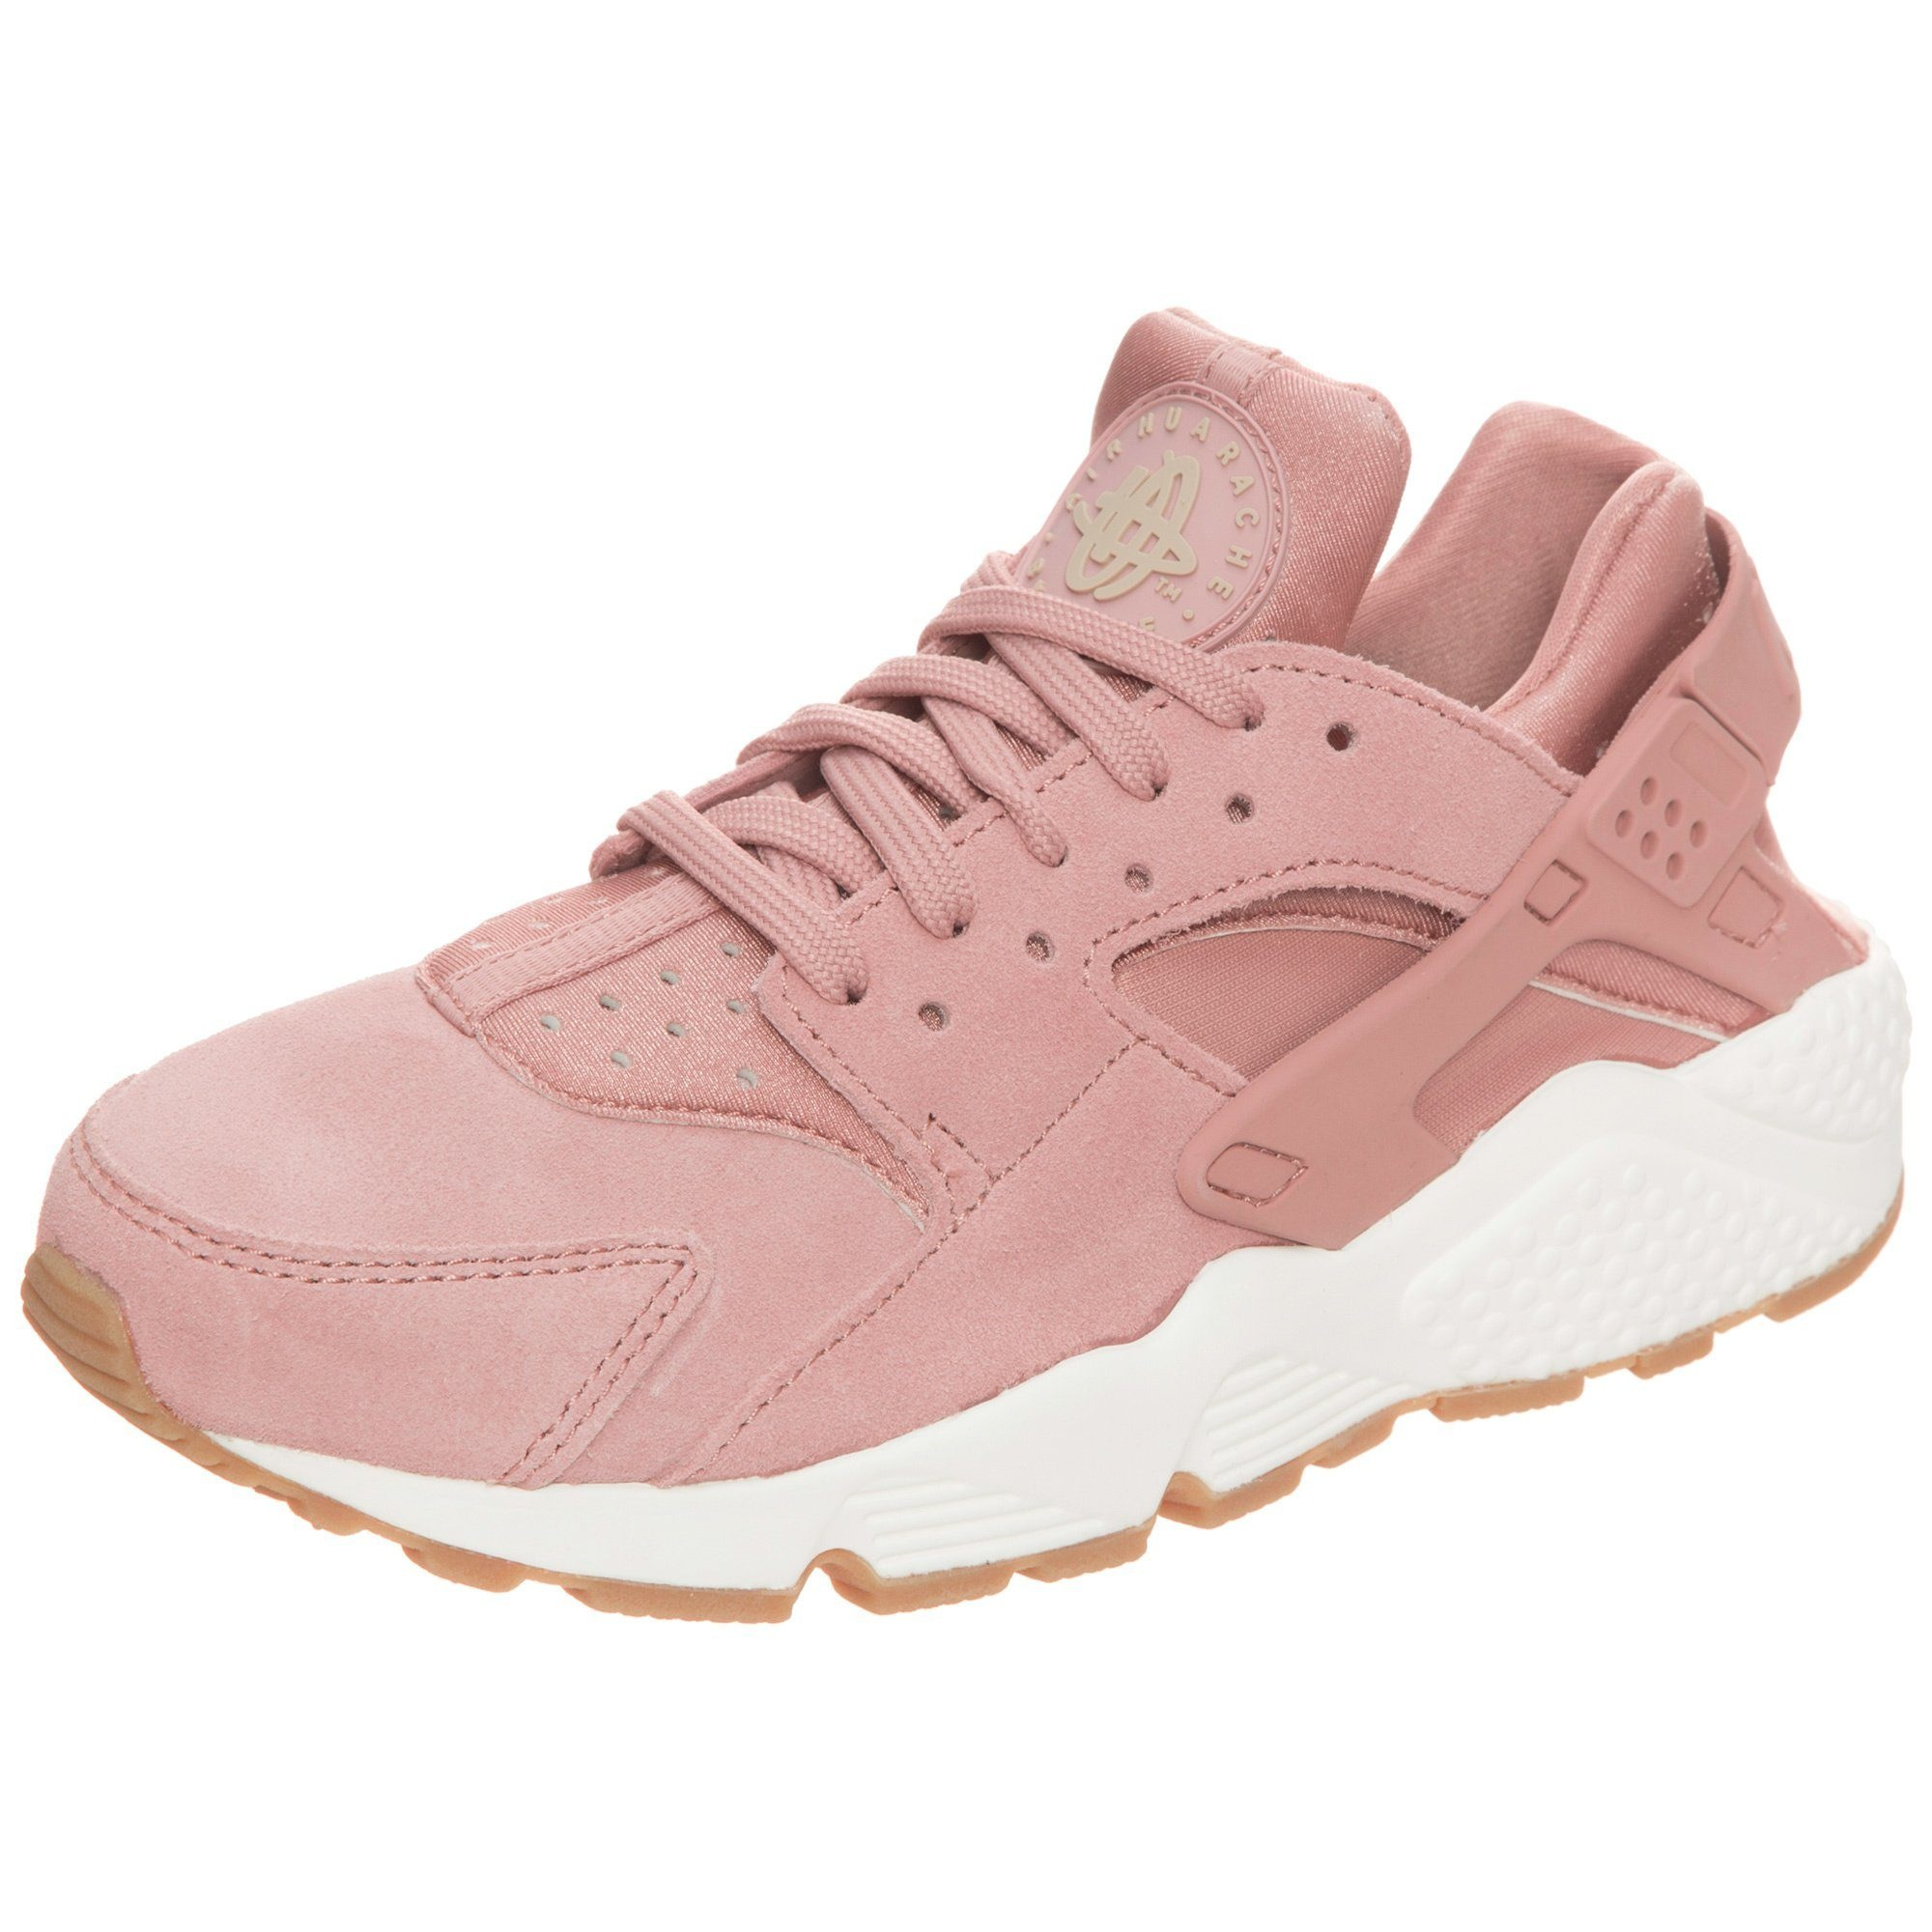 Nike Sportswear Sneaker Air Huarache Run Ultra Preis-Leistungs-Verhältnis, per Rechnung | Gutes Preis-Leistungs-Verhältnis, Ultra es lohnt sich b07f66